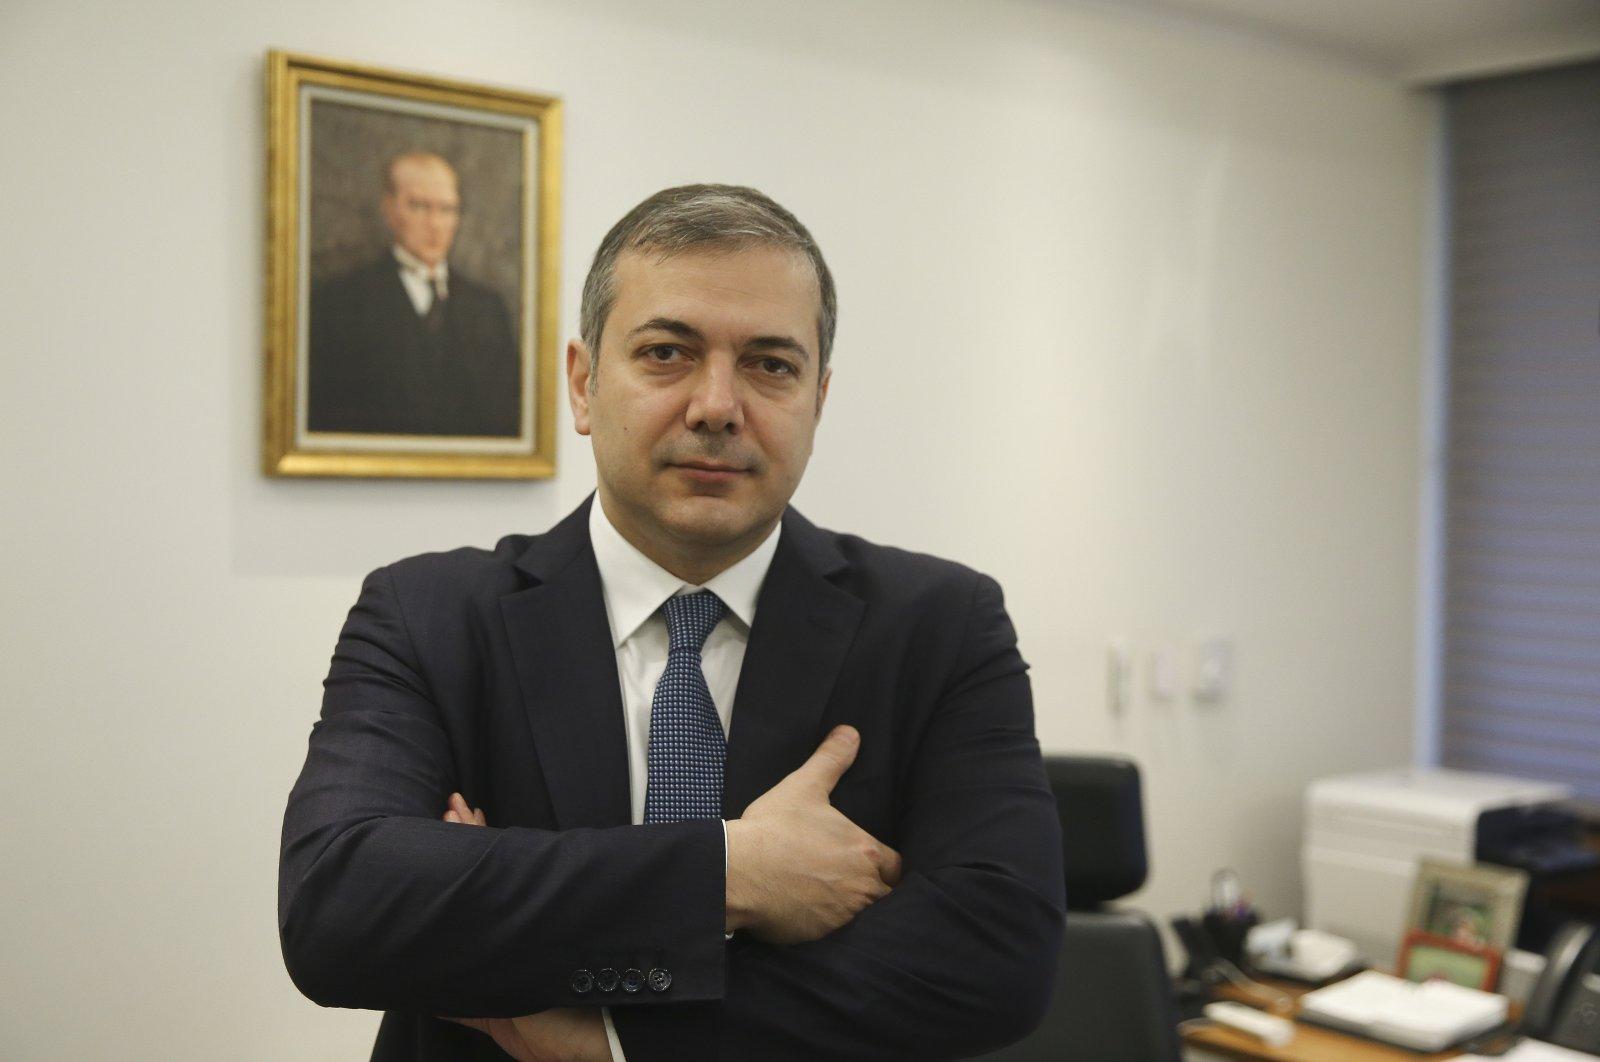 Central Bank of the Republic of Turkey (CBRT) Deputy Governor Murat Çetinkaya is seen at this office in the capital Ankara, Turkey, Feb. 11, 2020. (AA Photo)